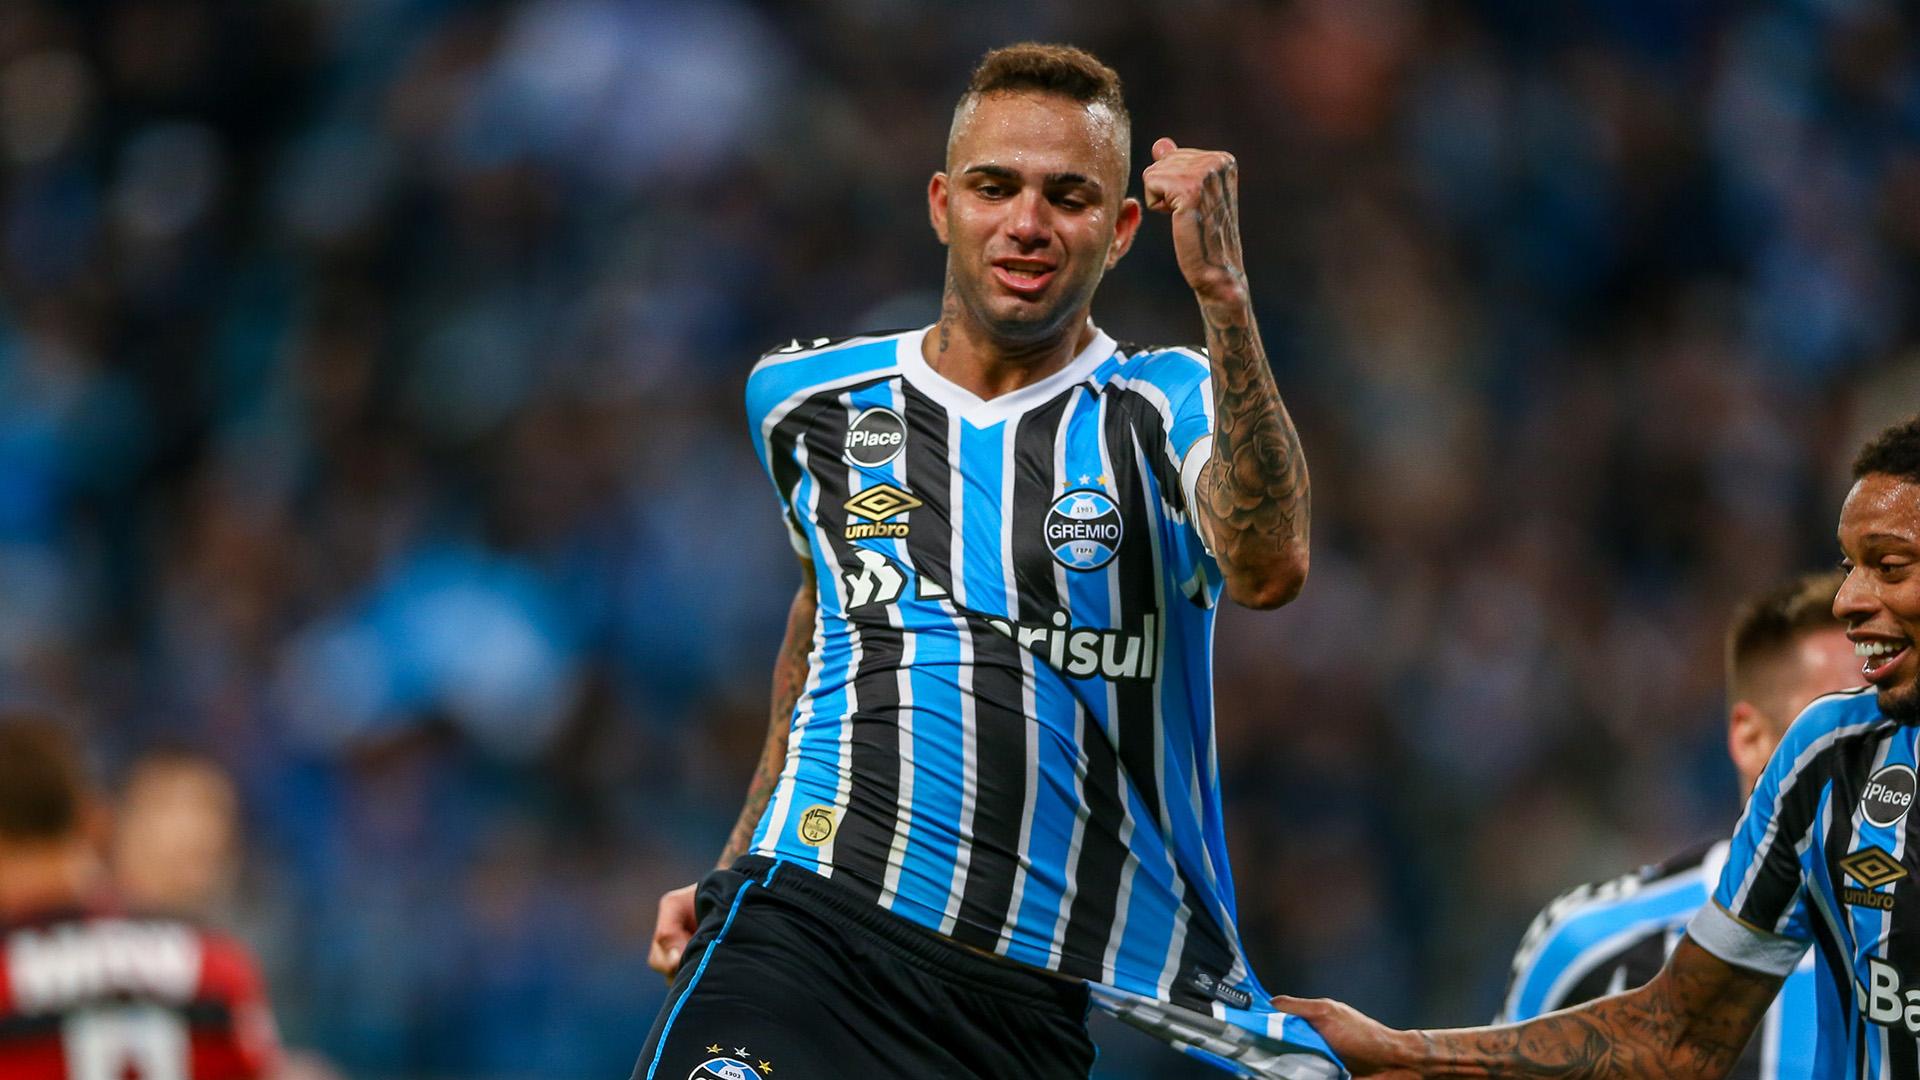 Luan Guilherme Gremio Flamengo Copa do Brasil 01082018